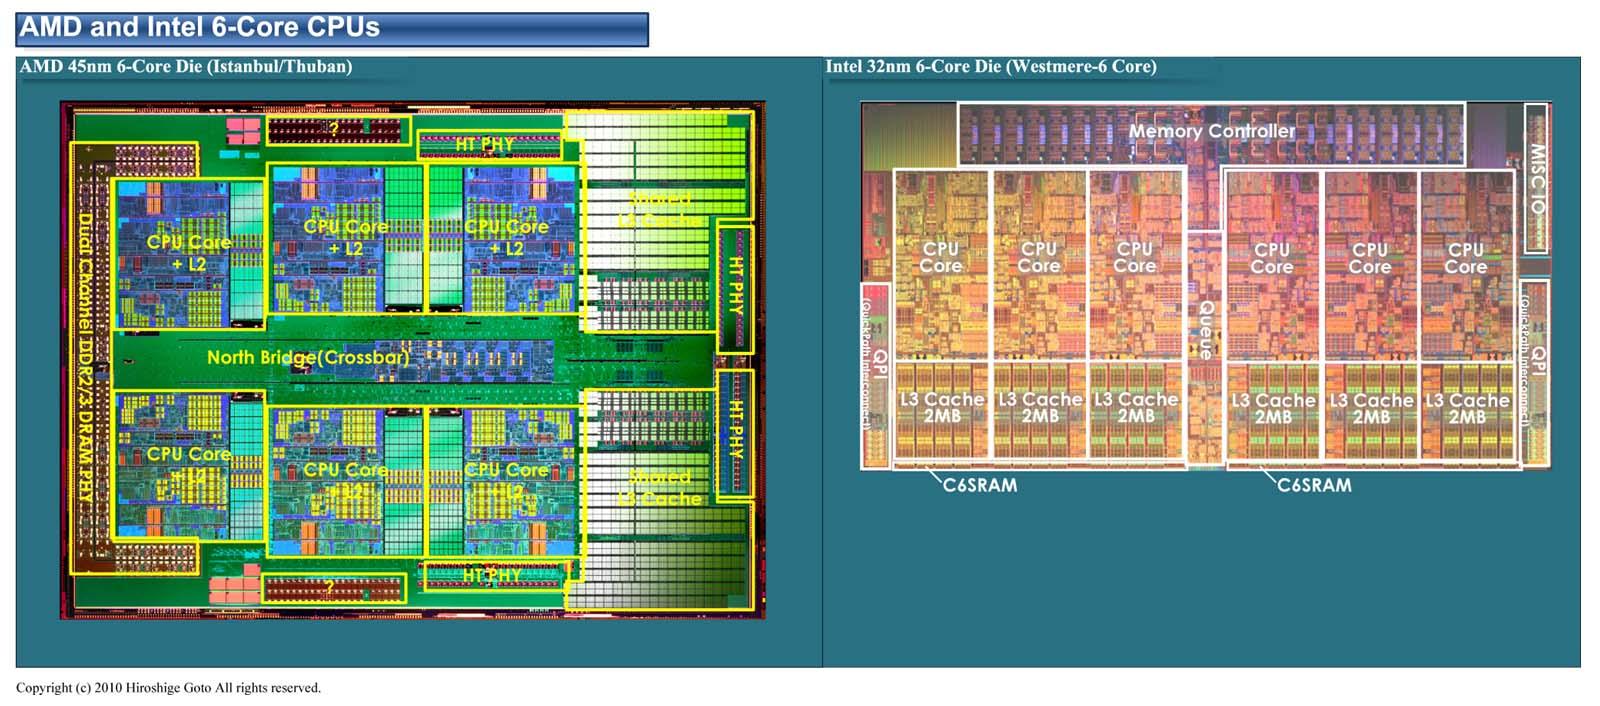 "AMD、Intelの6コア比較<br>PDF版は<a ipw_linktype=""filelink_raw"" ipw_id=""679152"" href=""/video/pcw/docs/364/107/p02.pdf"">こちら</a>"